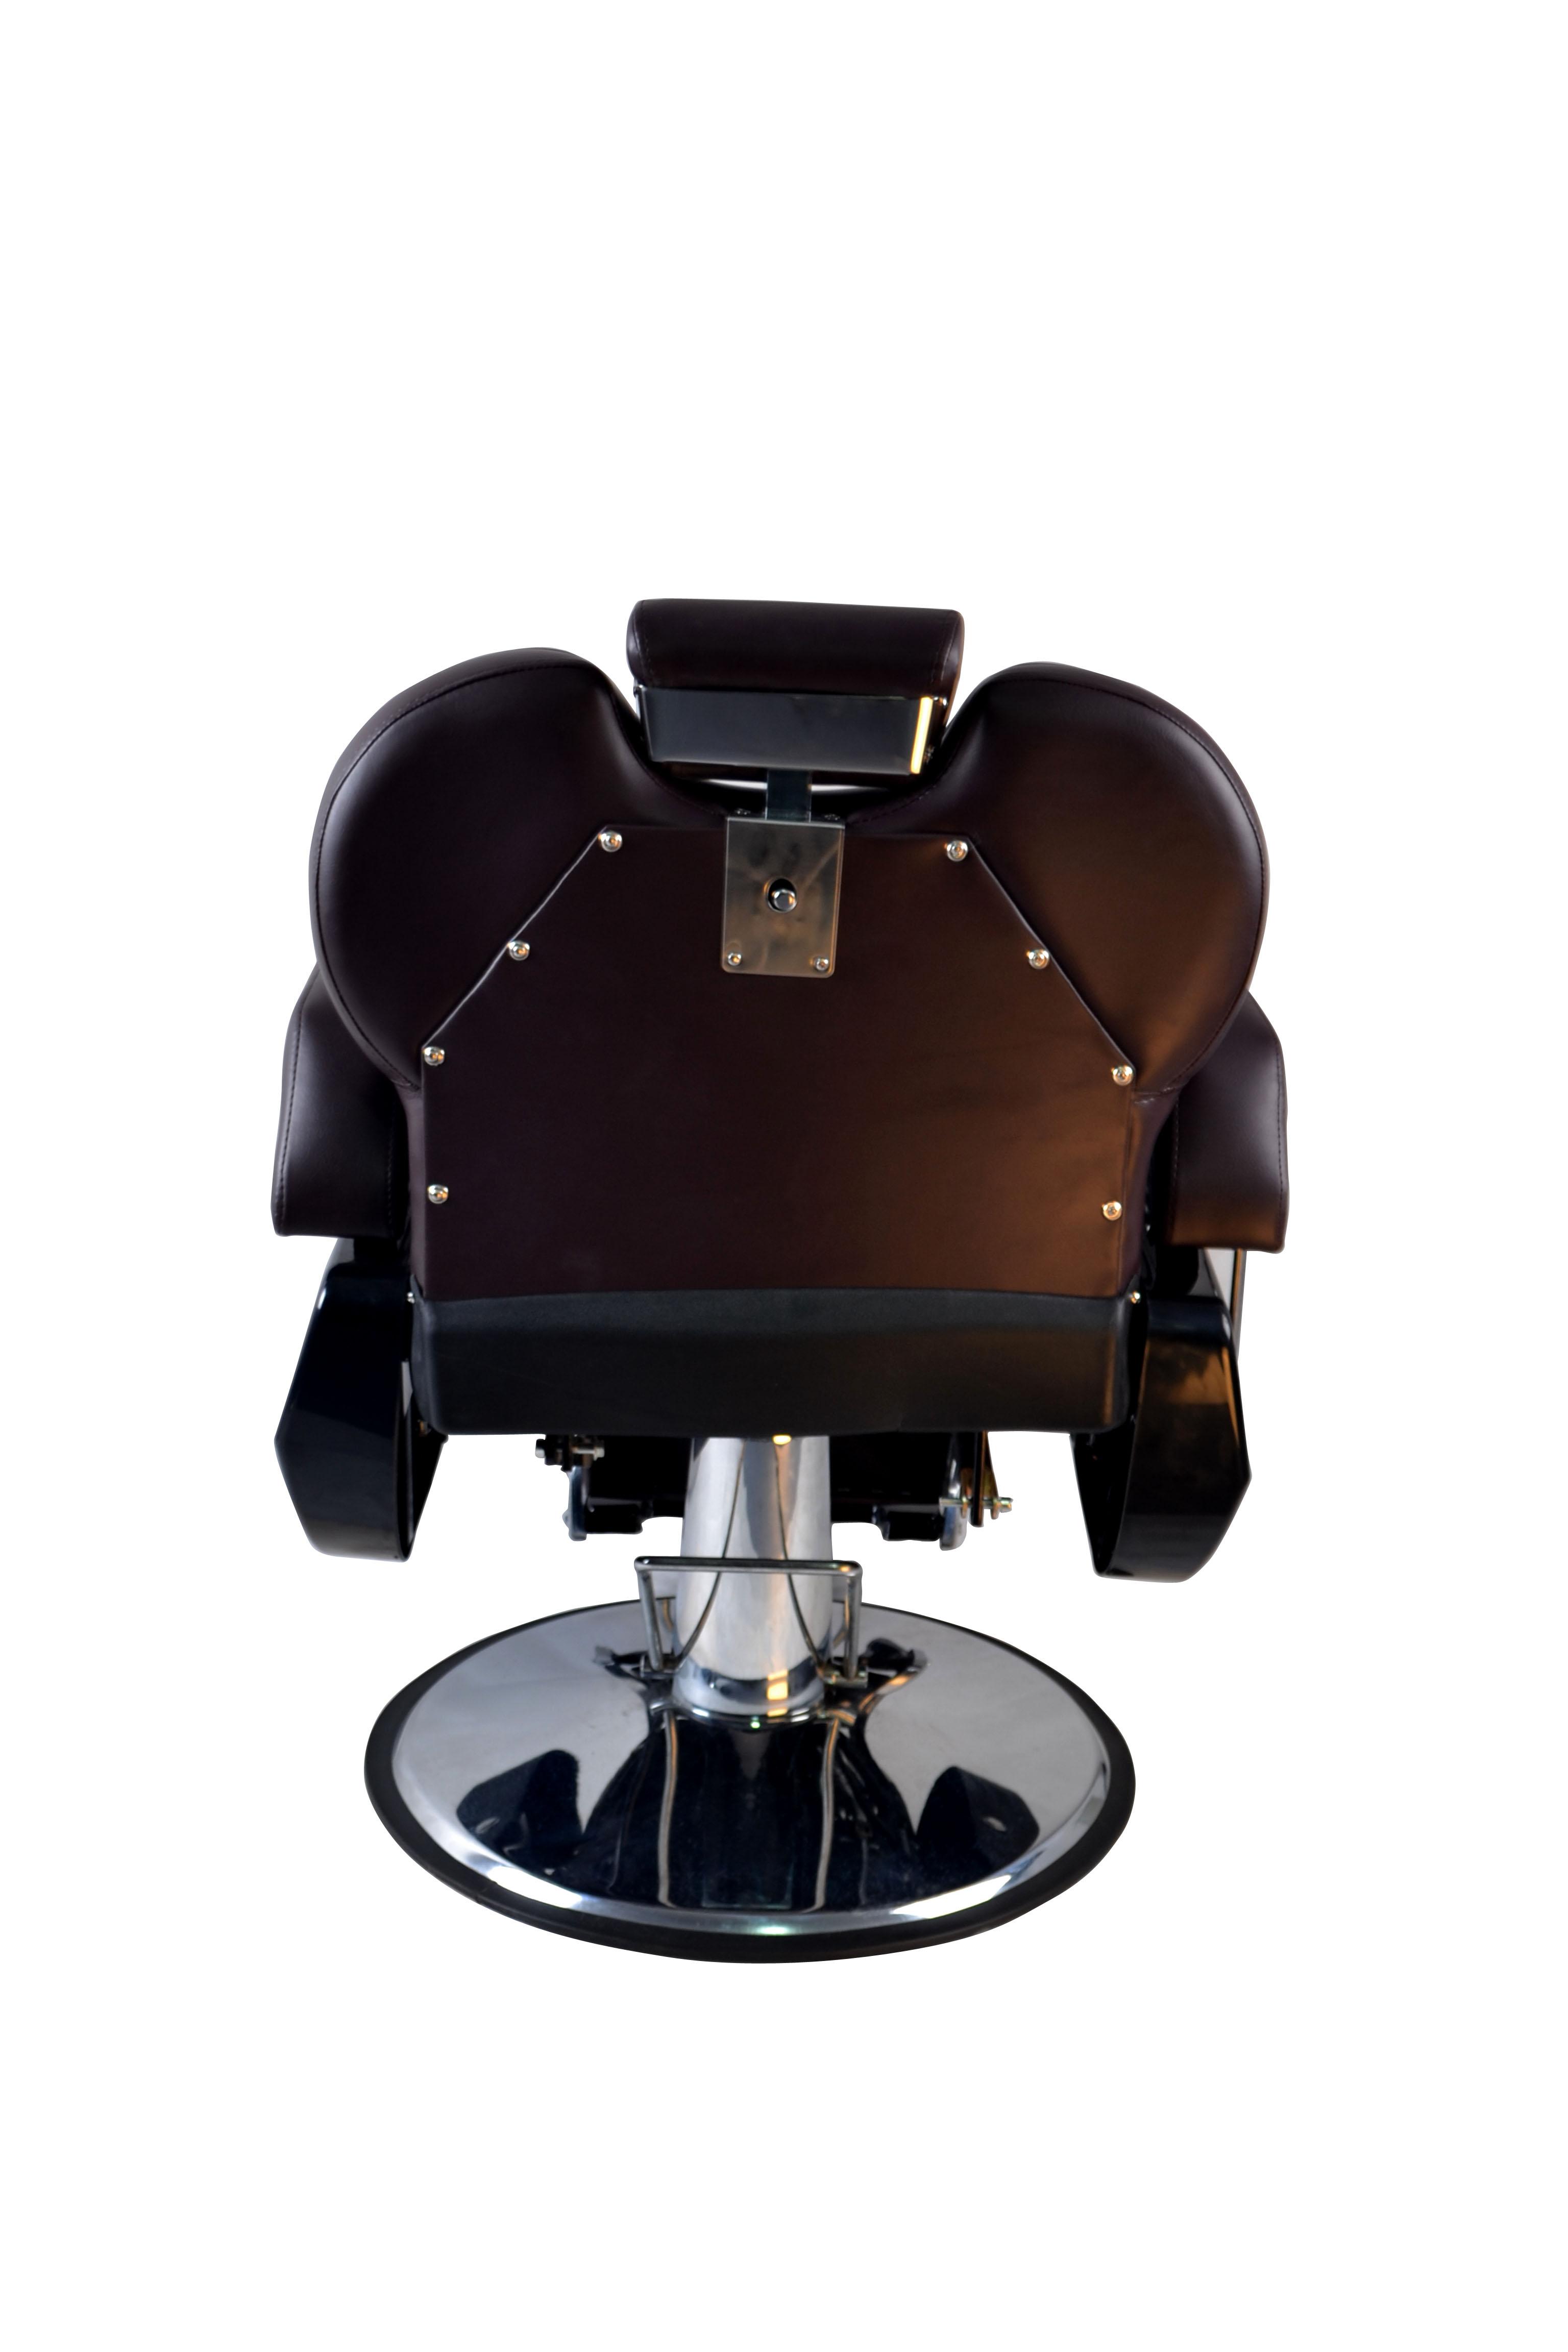 BarberPub All Purpose Hydraulic Recline Barber Chair Salon Beauty Spa 8702 Brown 15